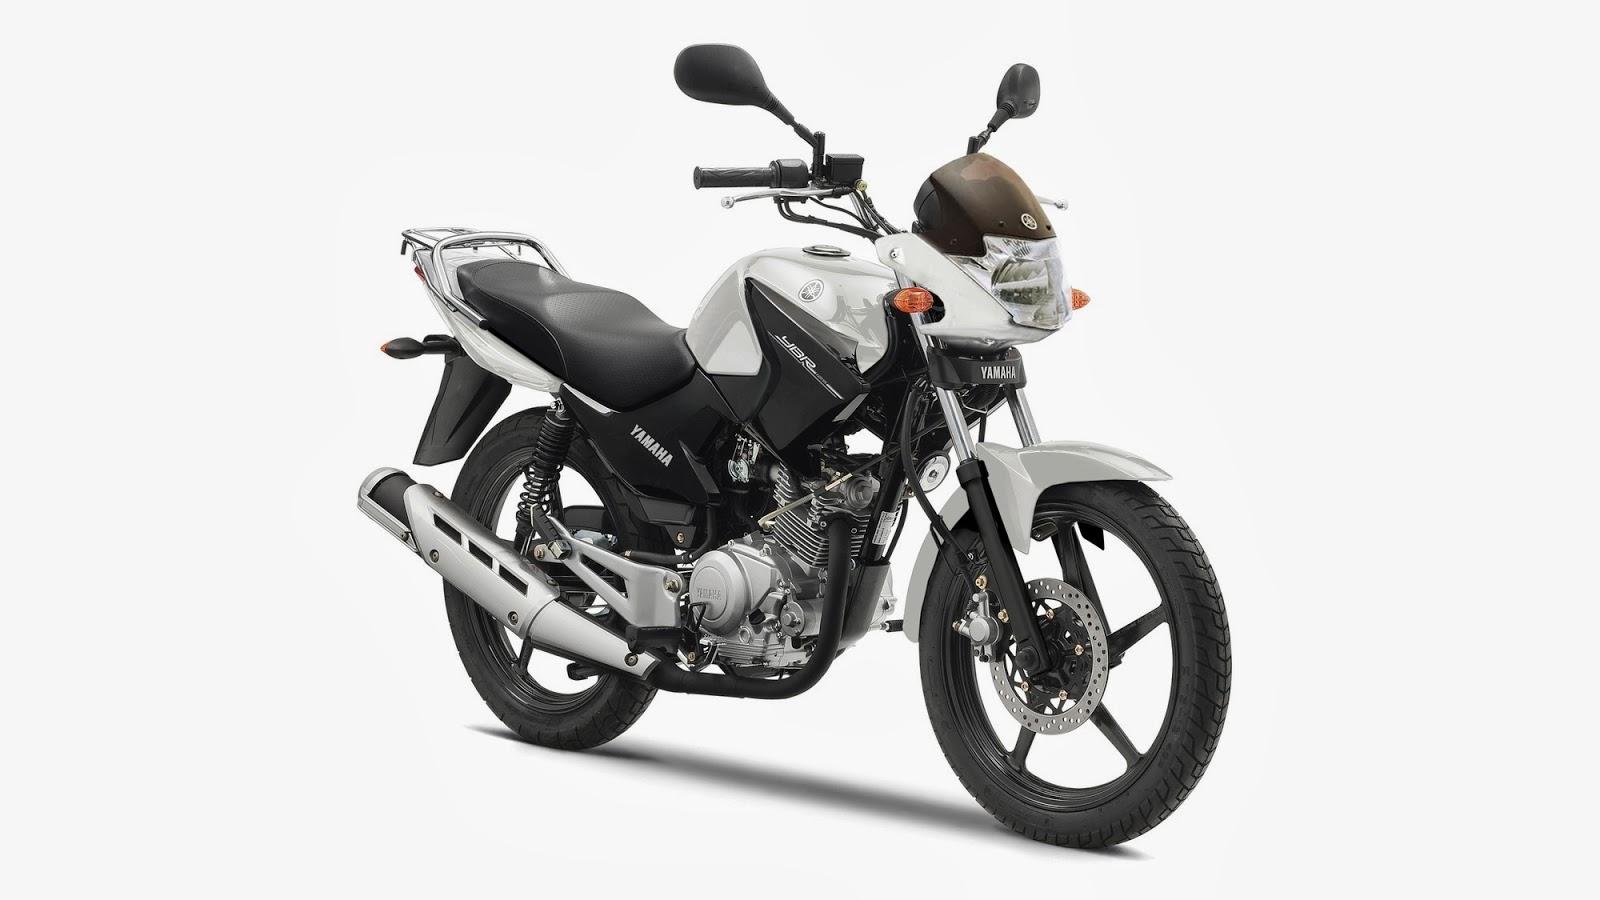 Yamaha Sport Roadster YBR 125 cc Bike Gallery